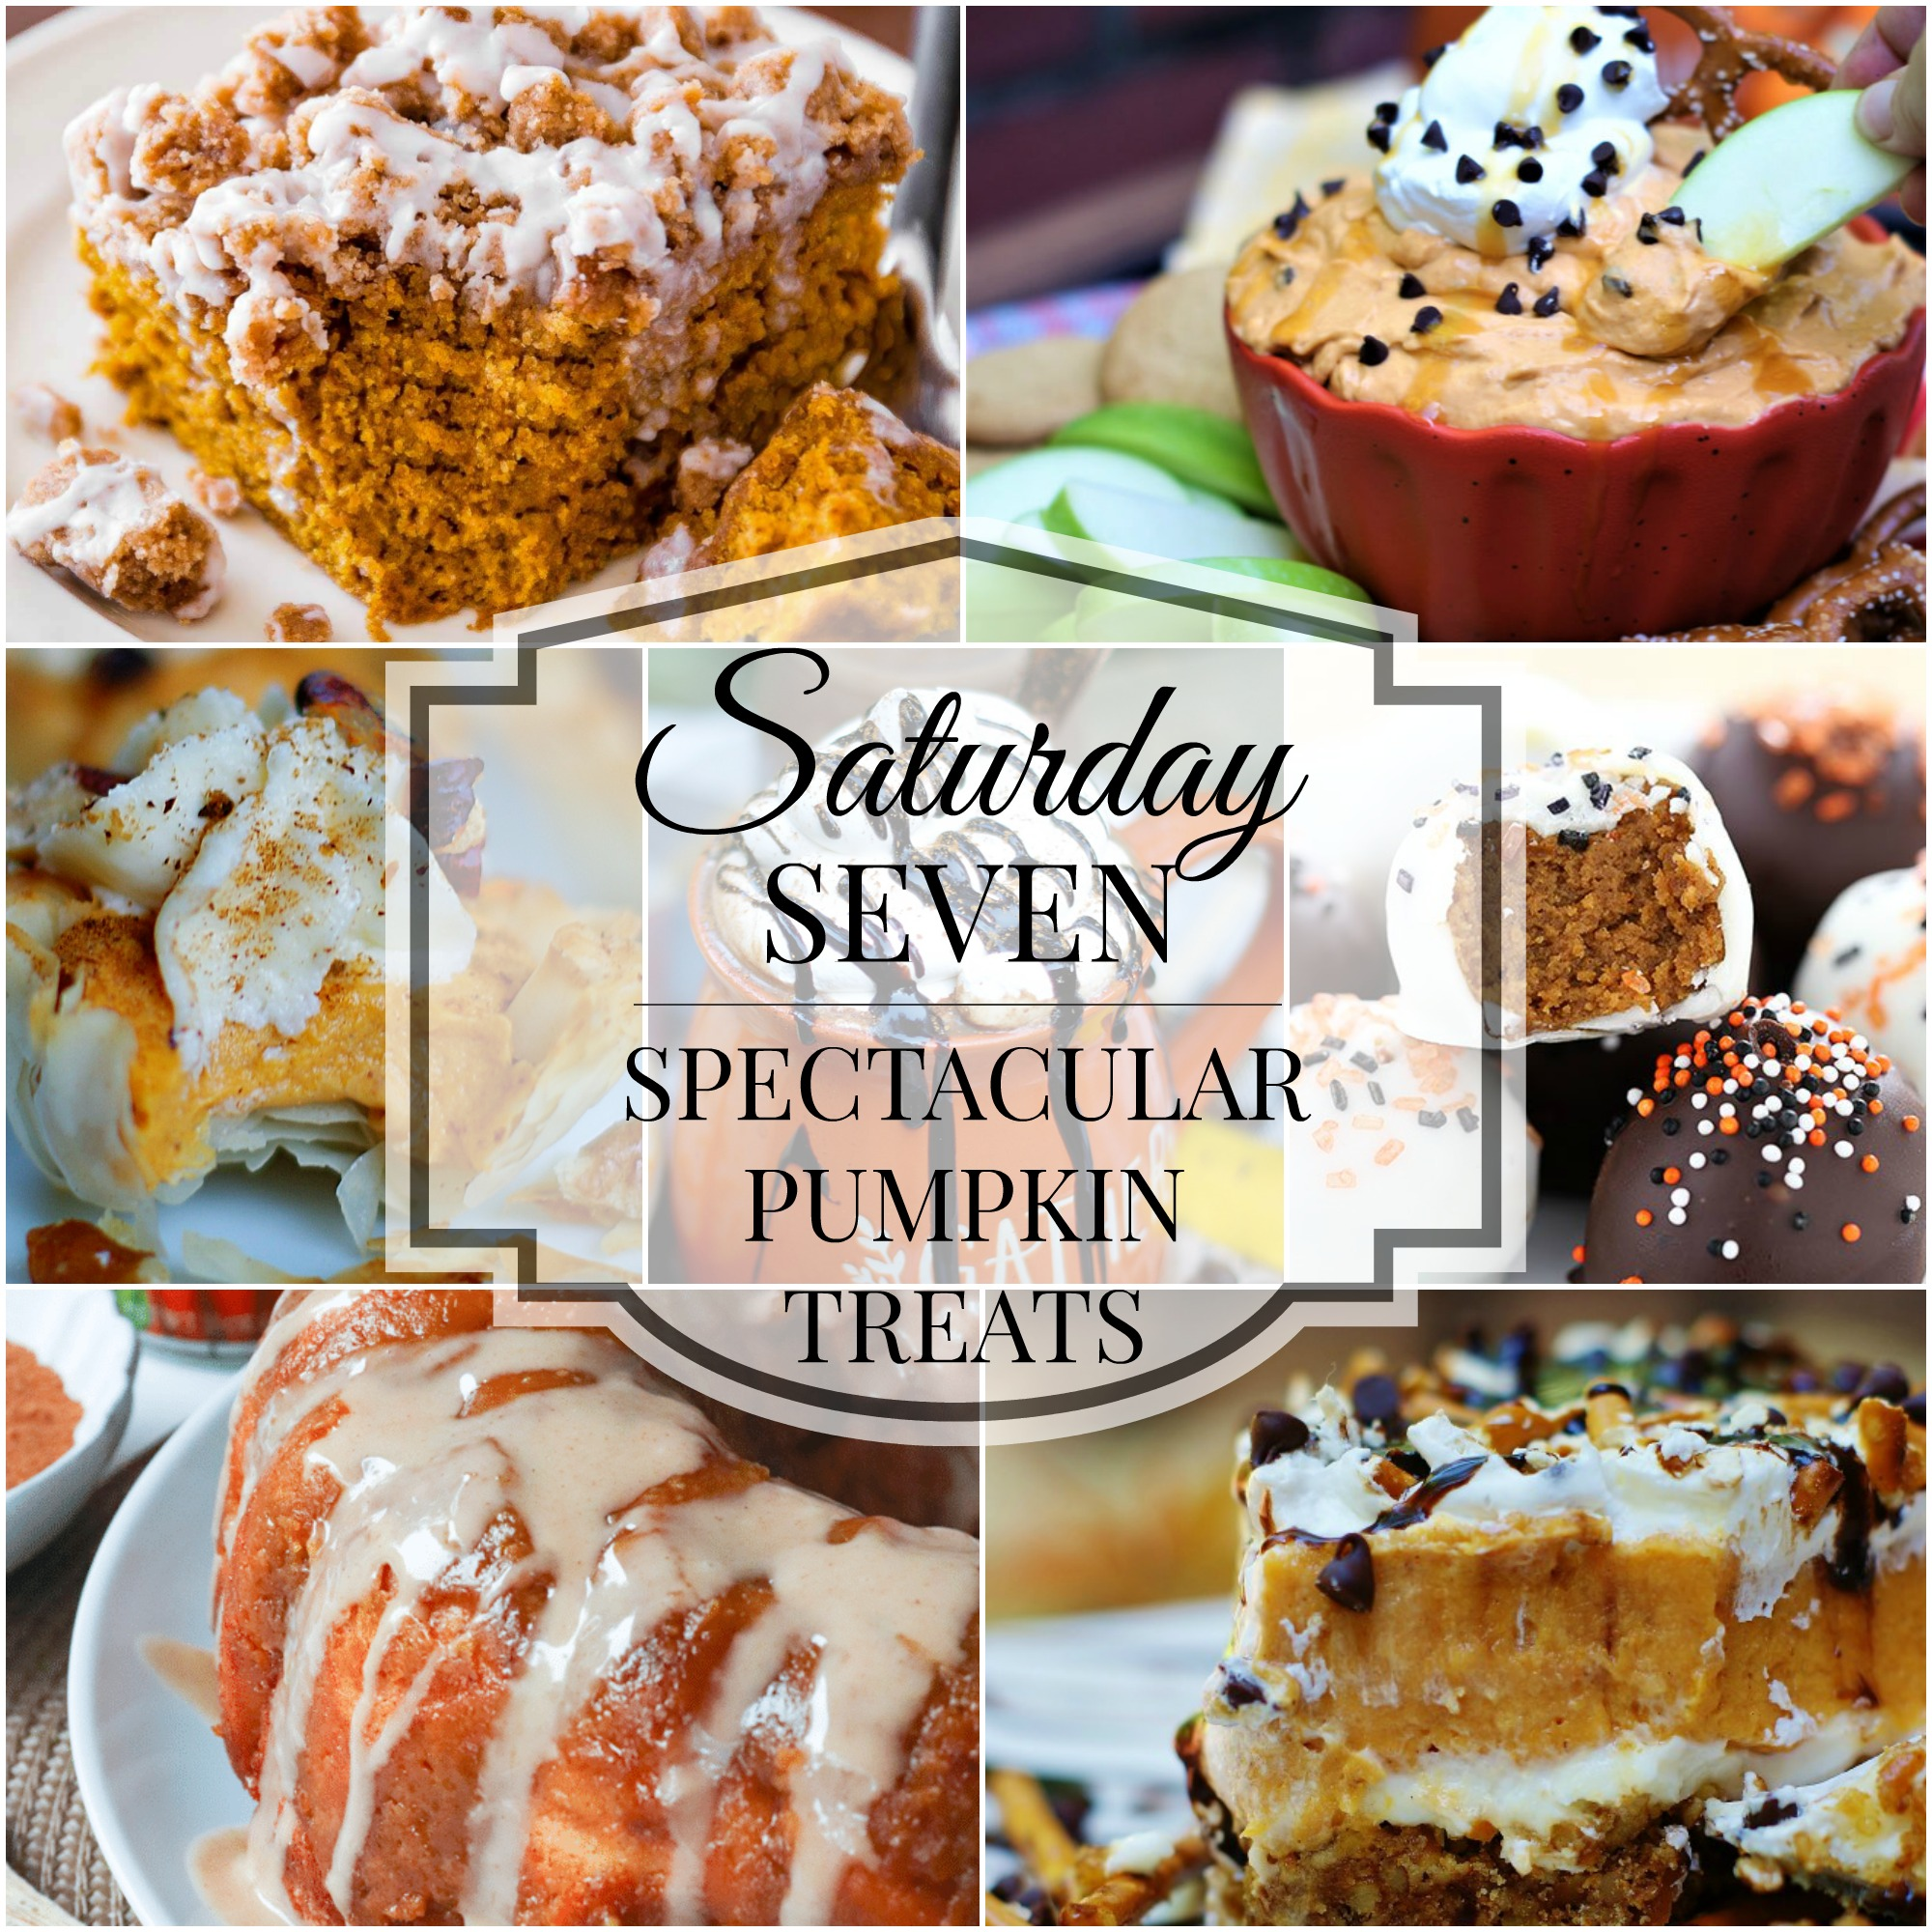 Saturday 7 pumpkin treats desserts collage